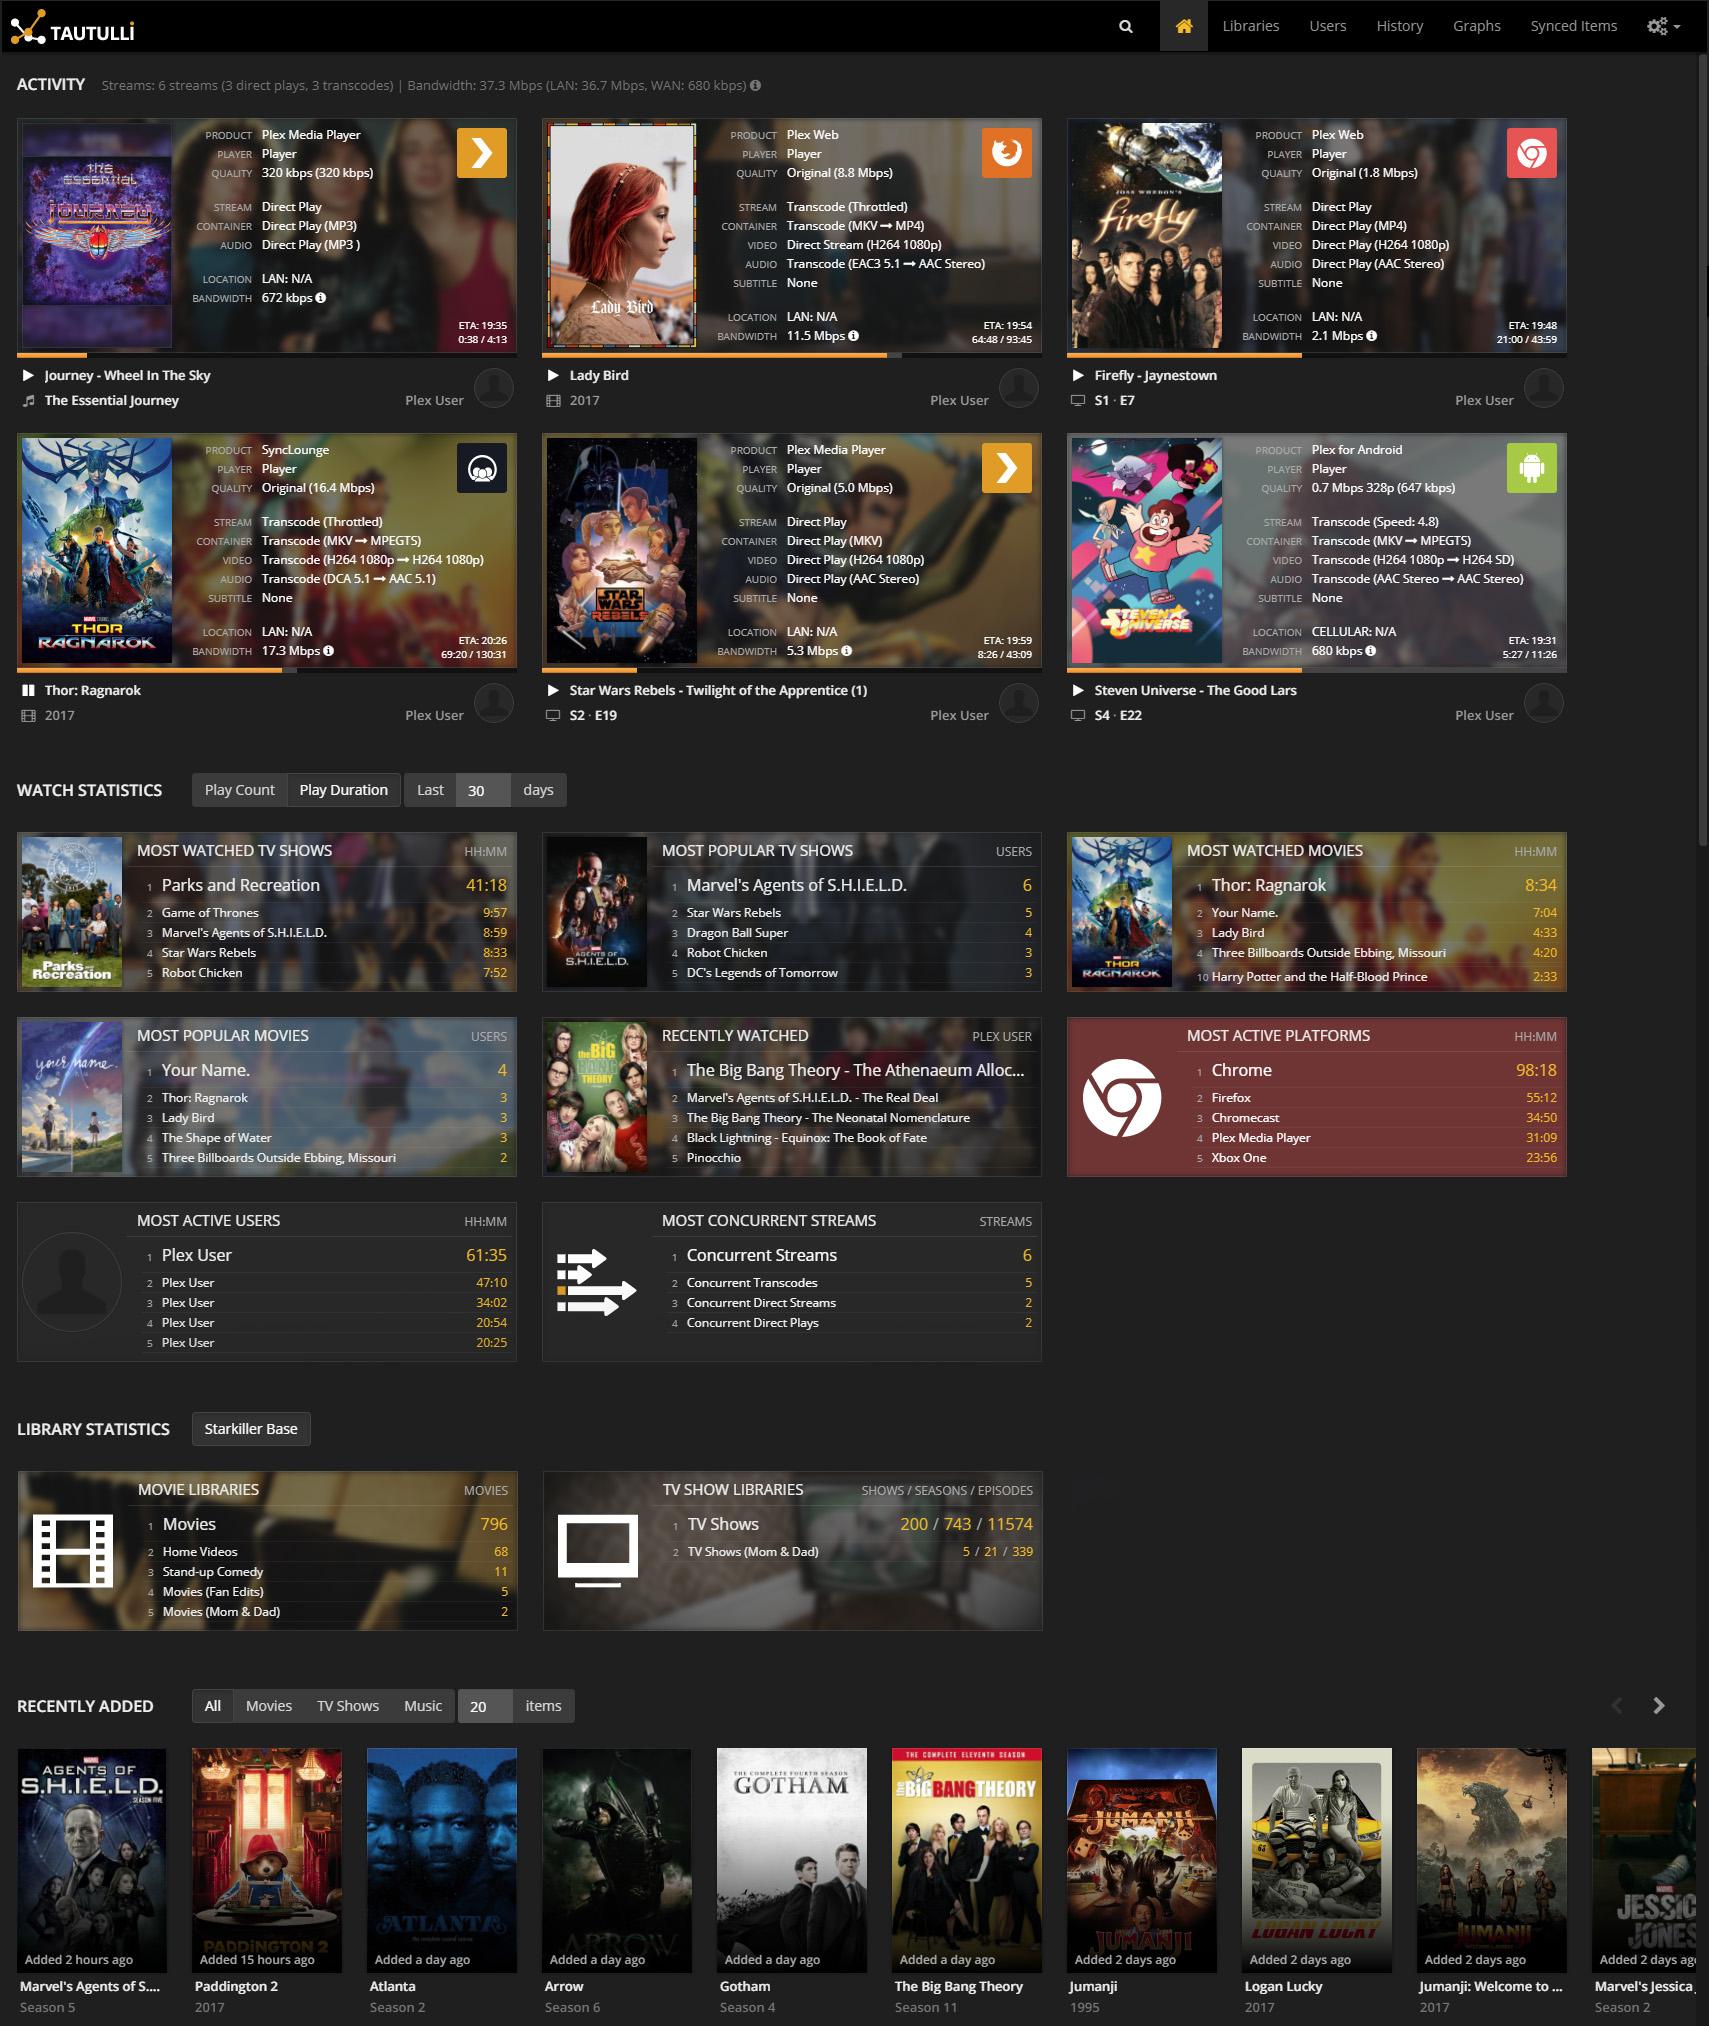 Tautulli Homepage